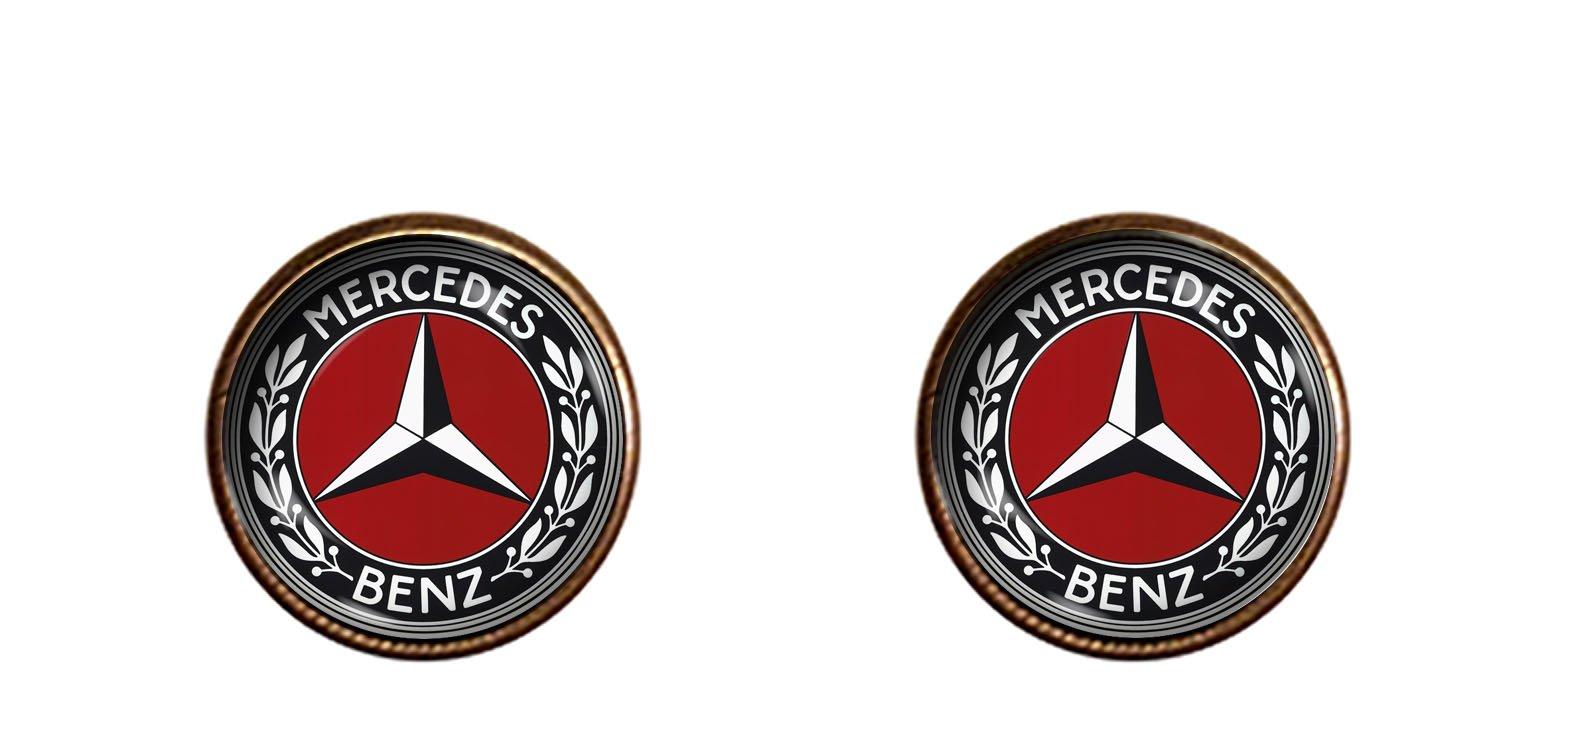 Mercedes Benz 12mm earrings handmade Automobile Wedding Groom jewelry gift charm